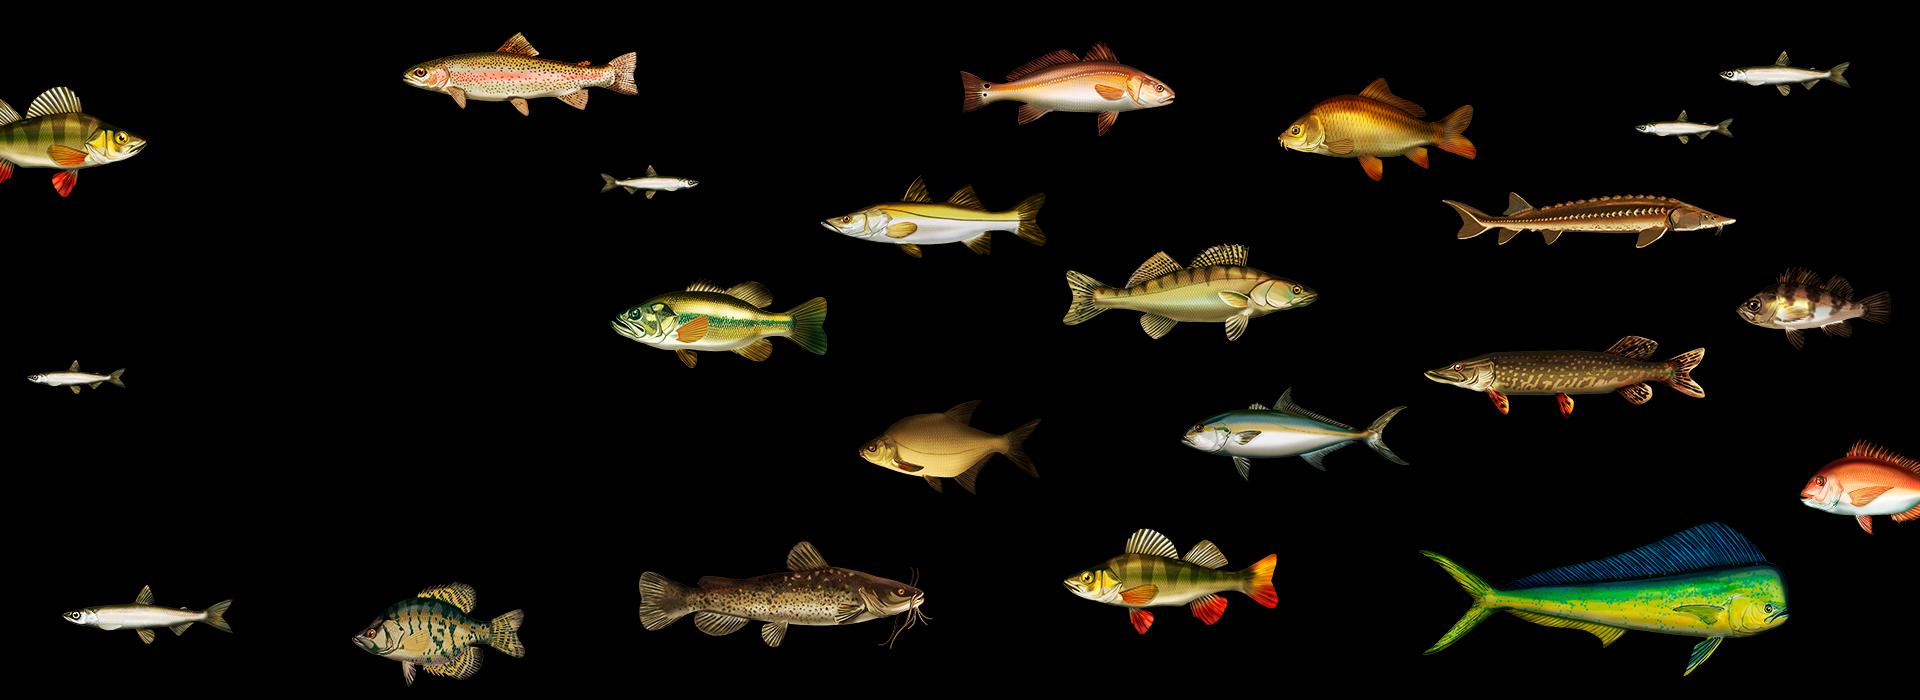 Эхолоты Deeper – вся рыба твоя Рыбачь с Deeper!